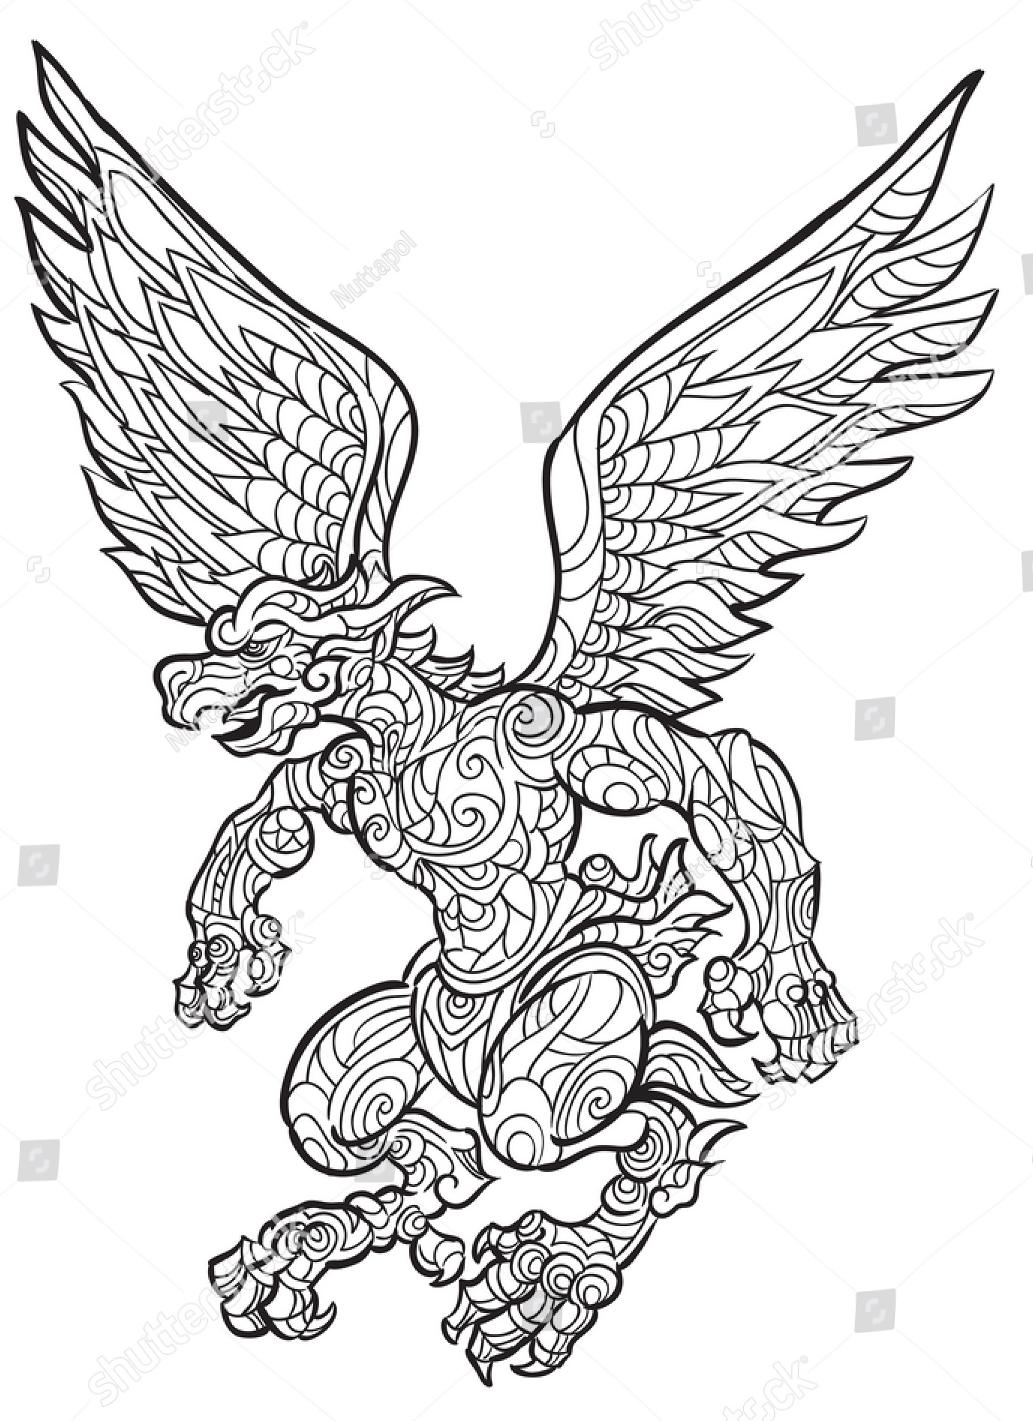 Koleksi Gambar Sketsa Lambang Garuda Terbaru